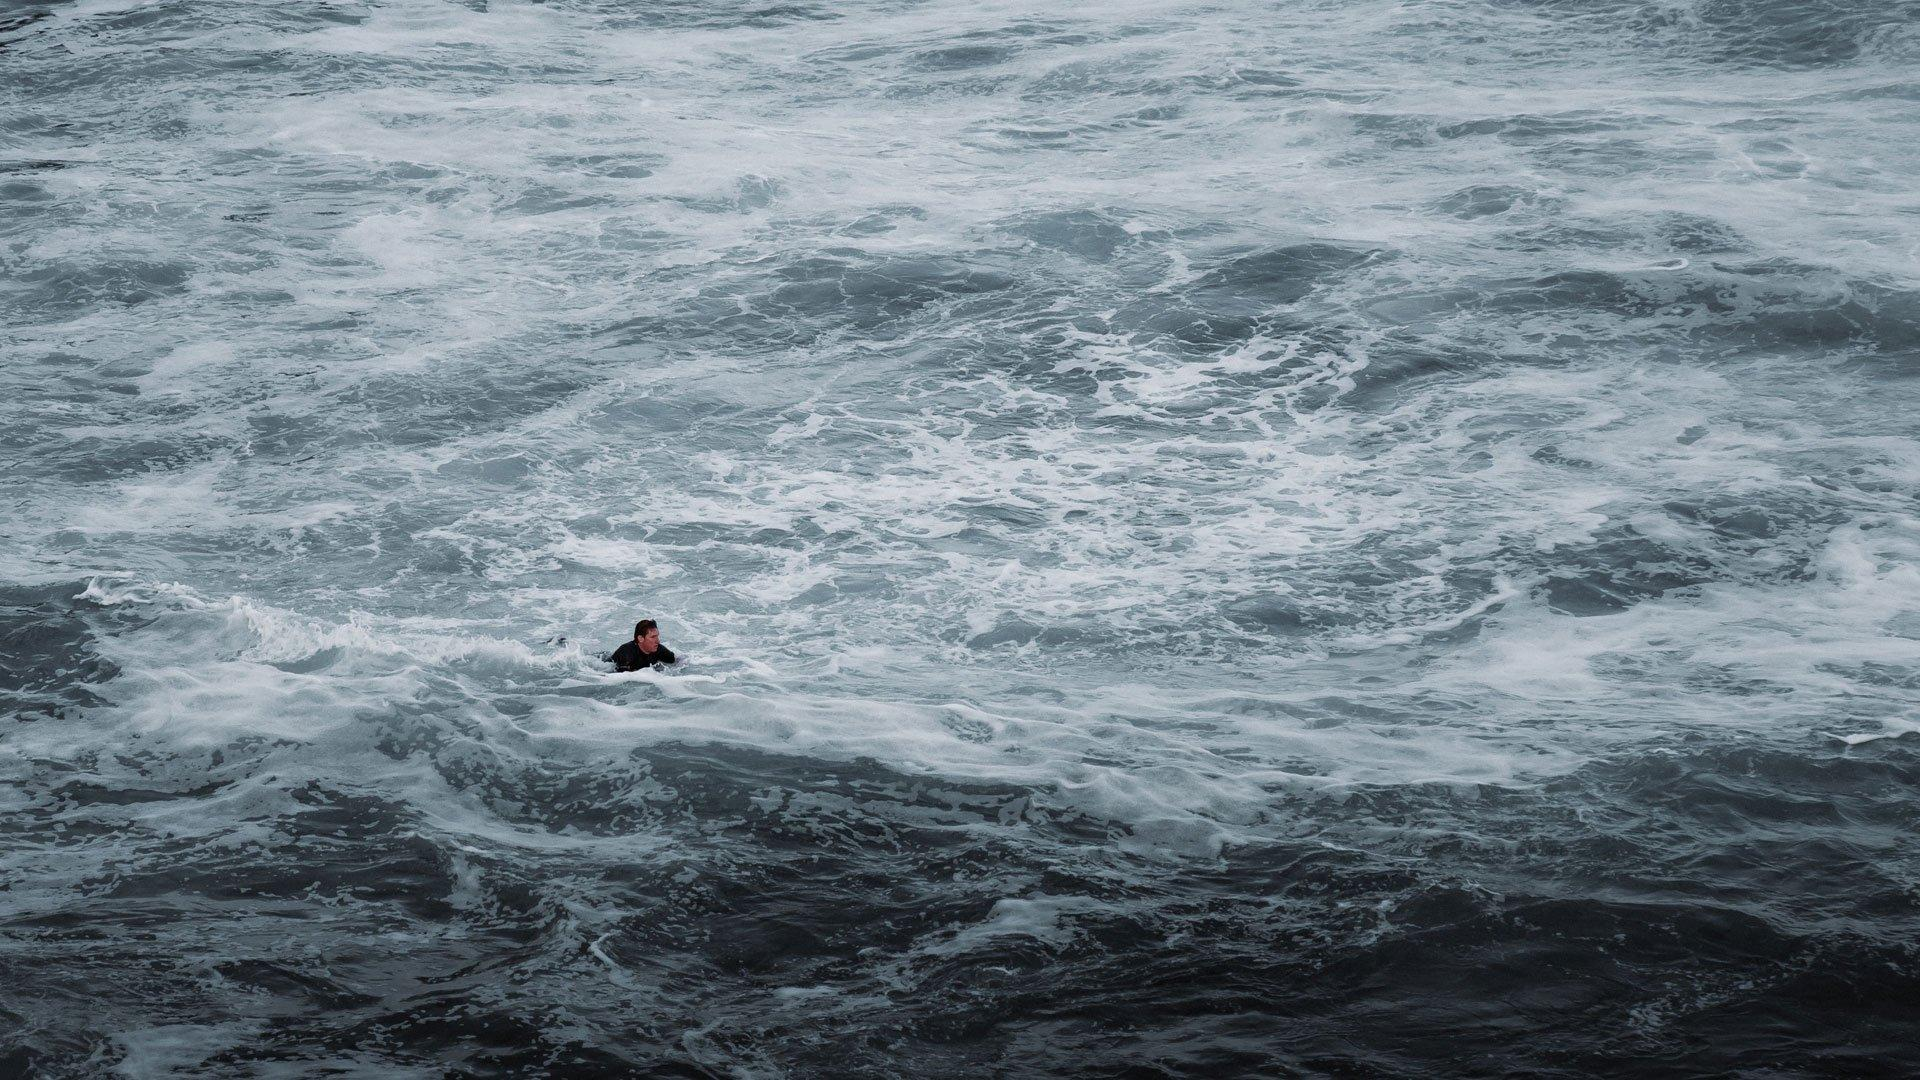 DrowningDanger